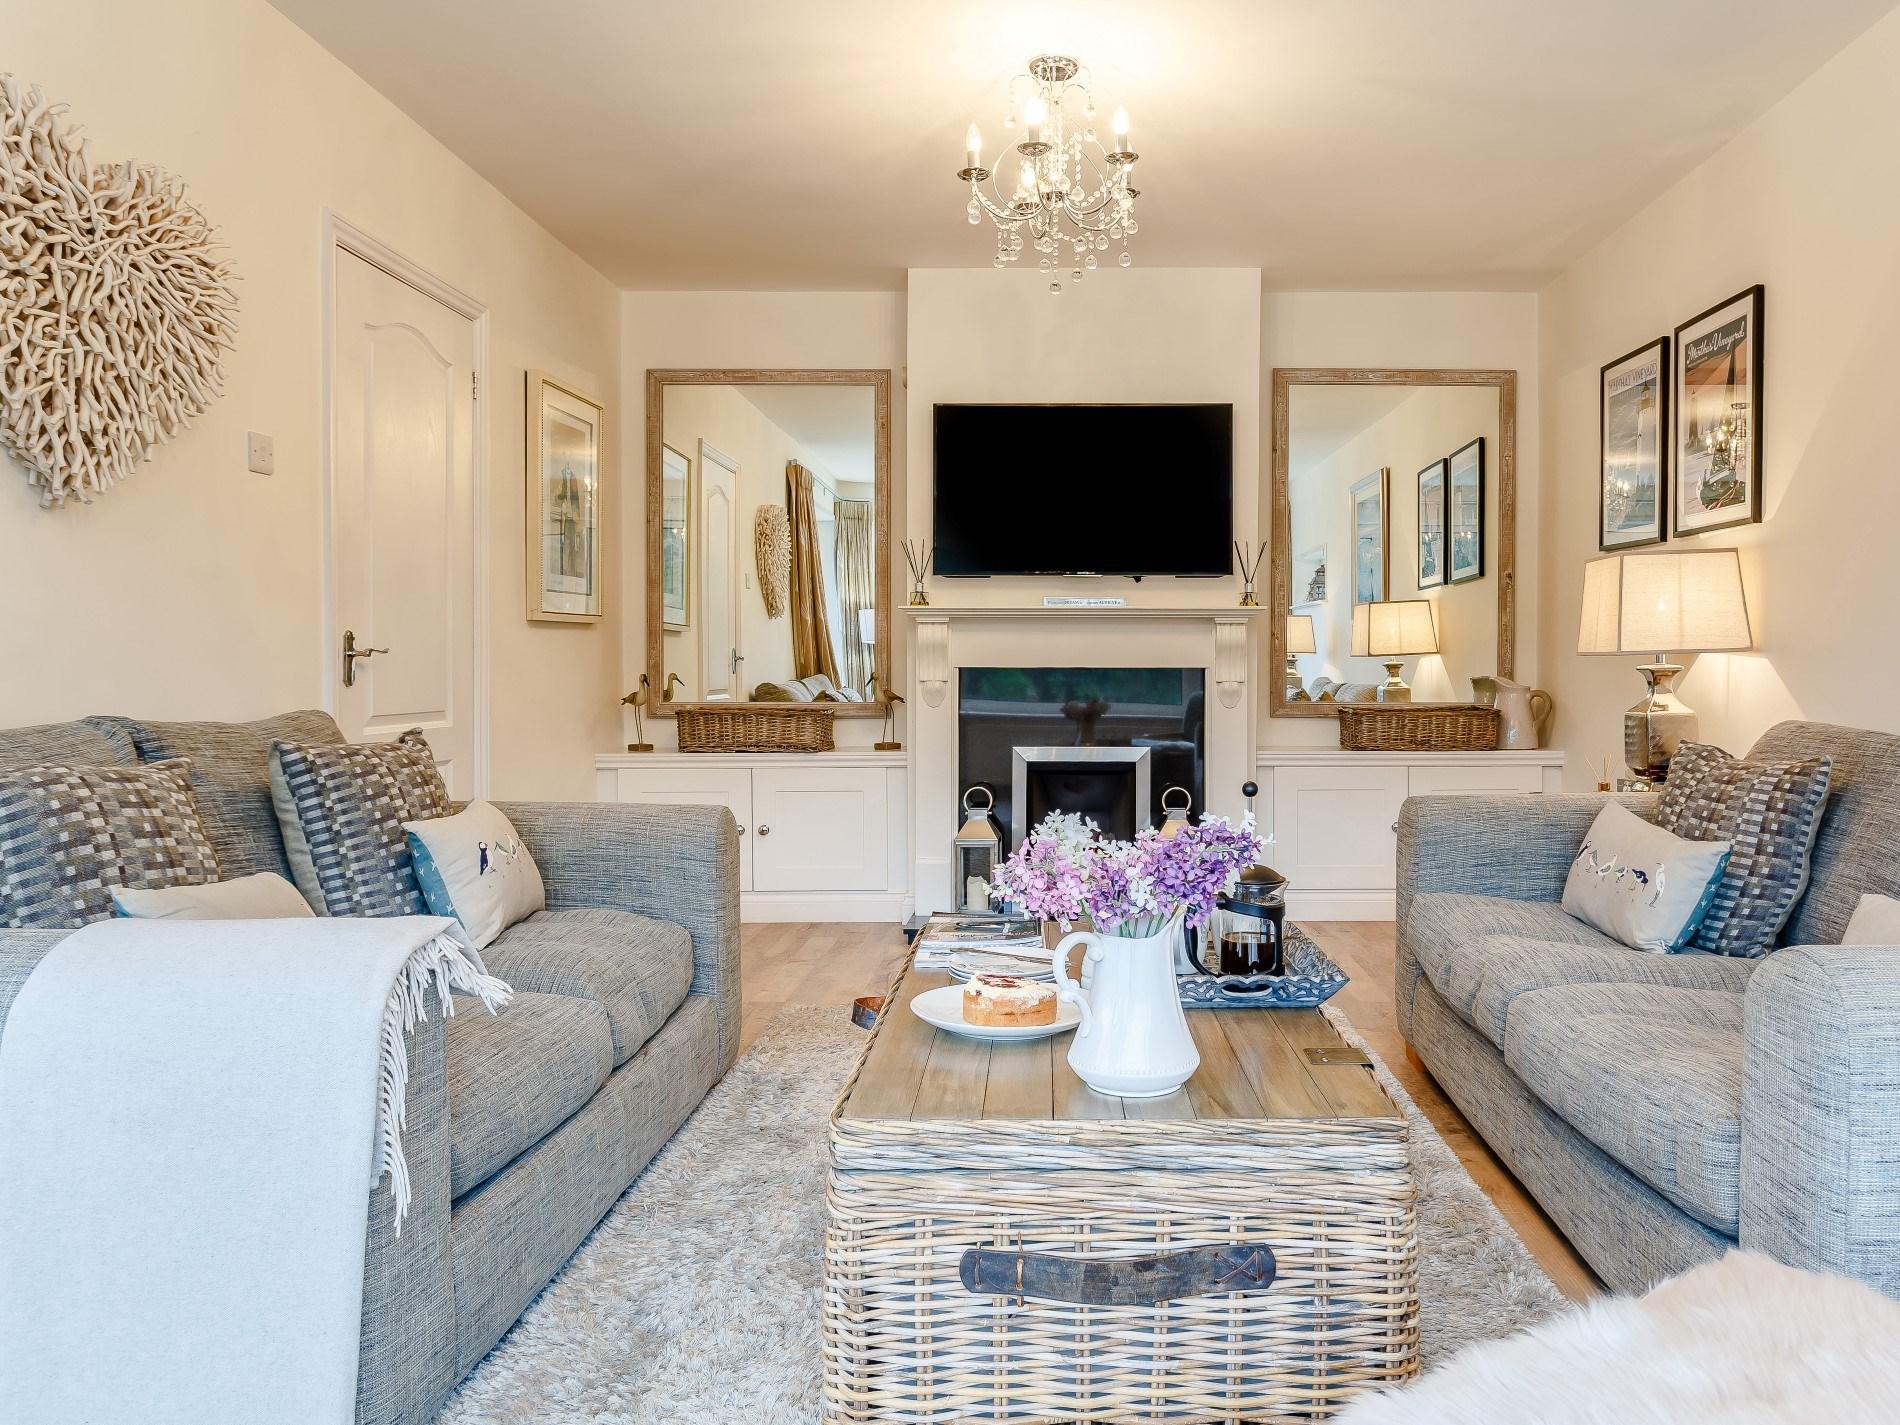 3 Bedroom Cottage in Ilfracombe, Devon